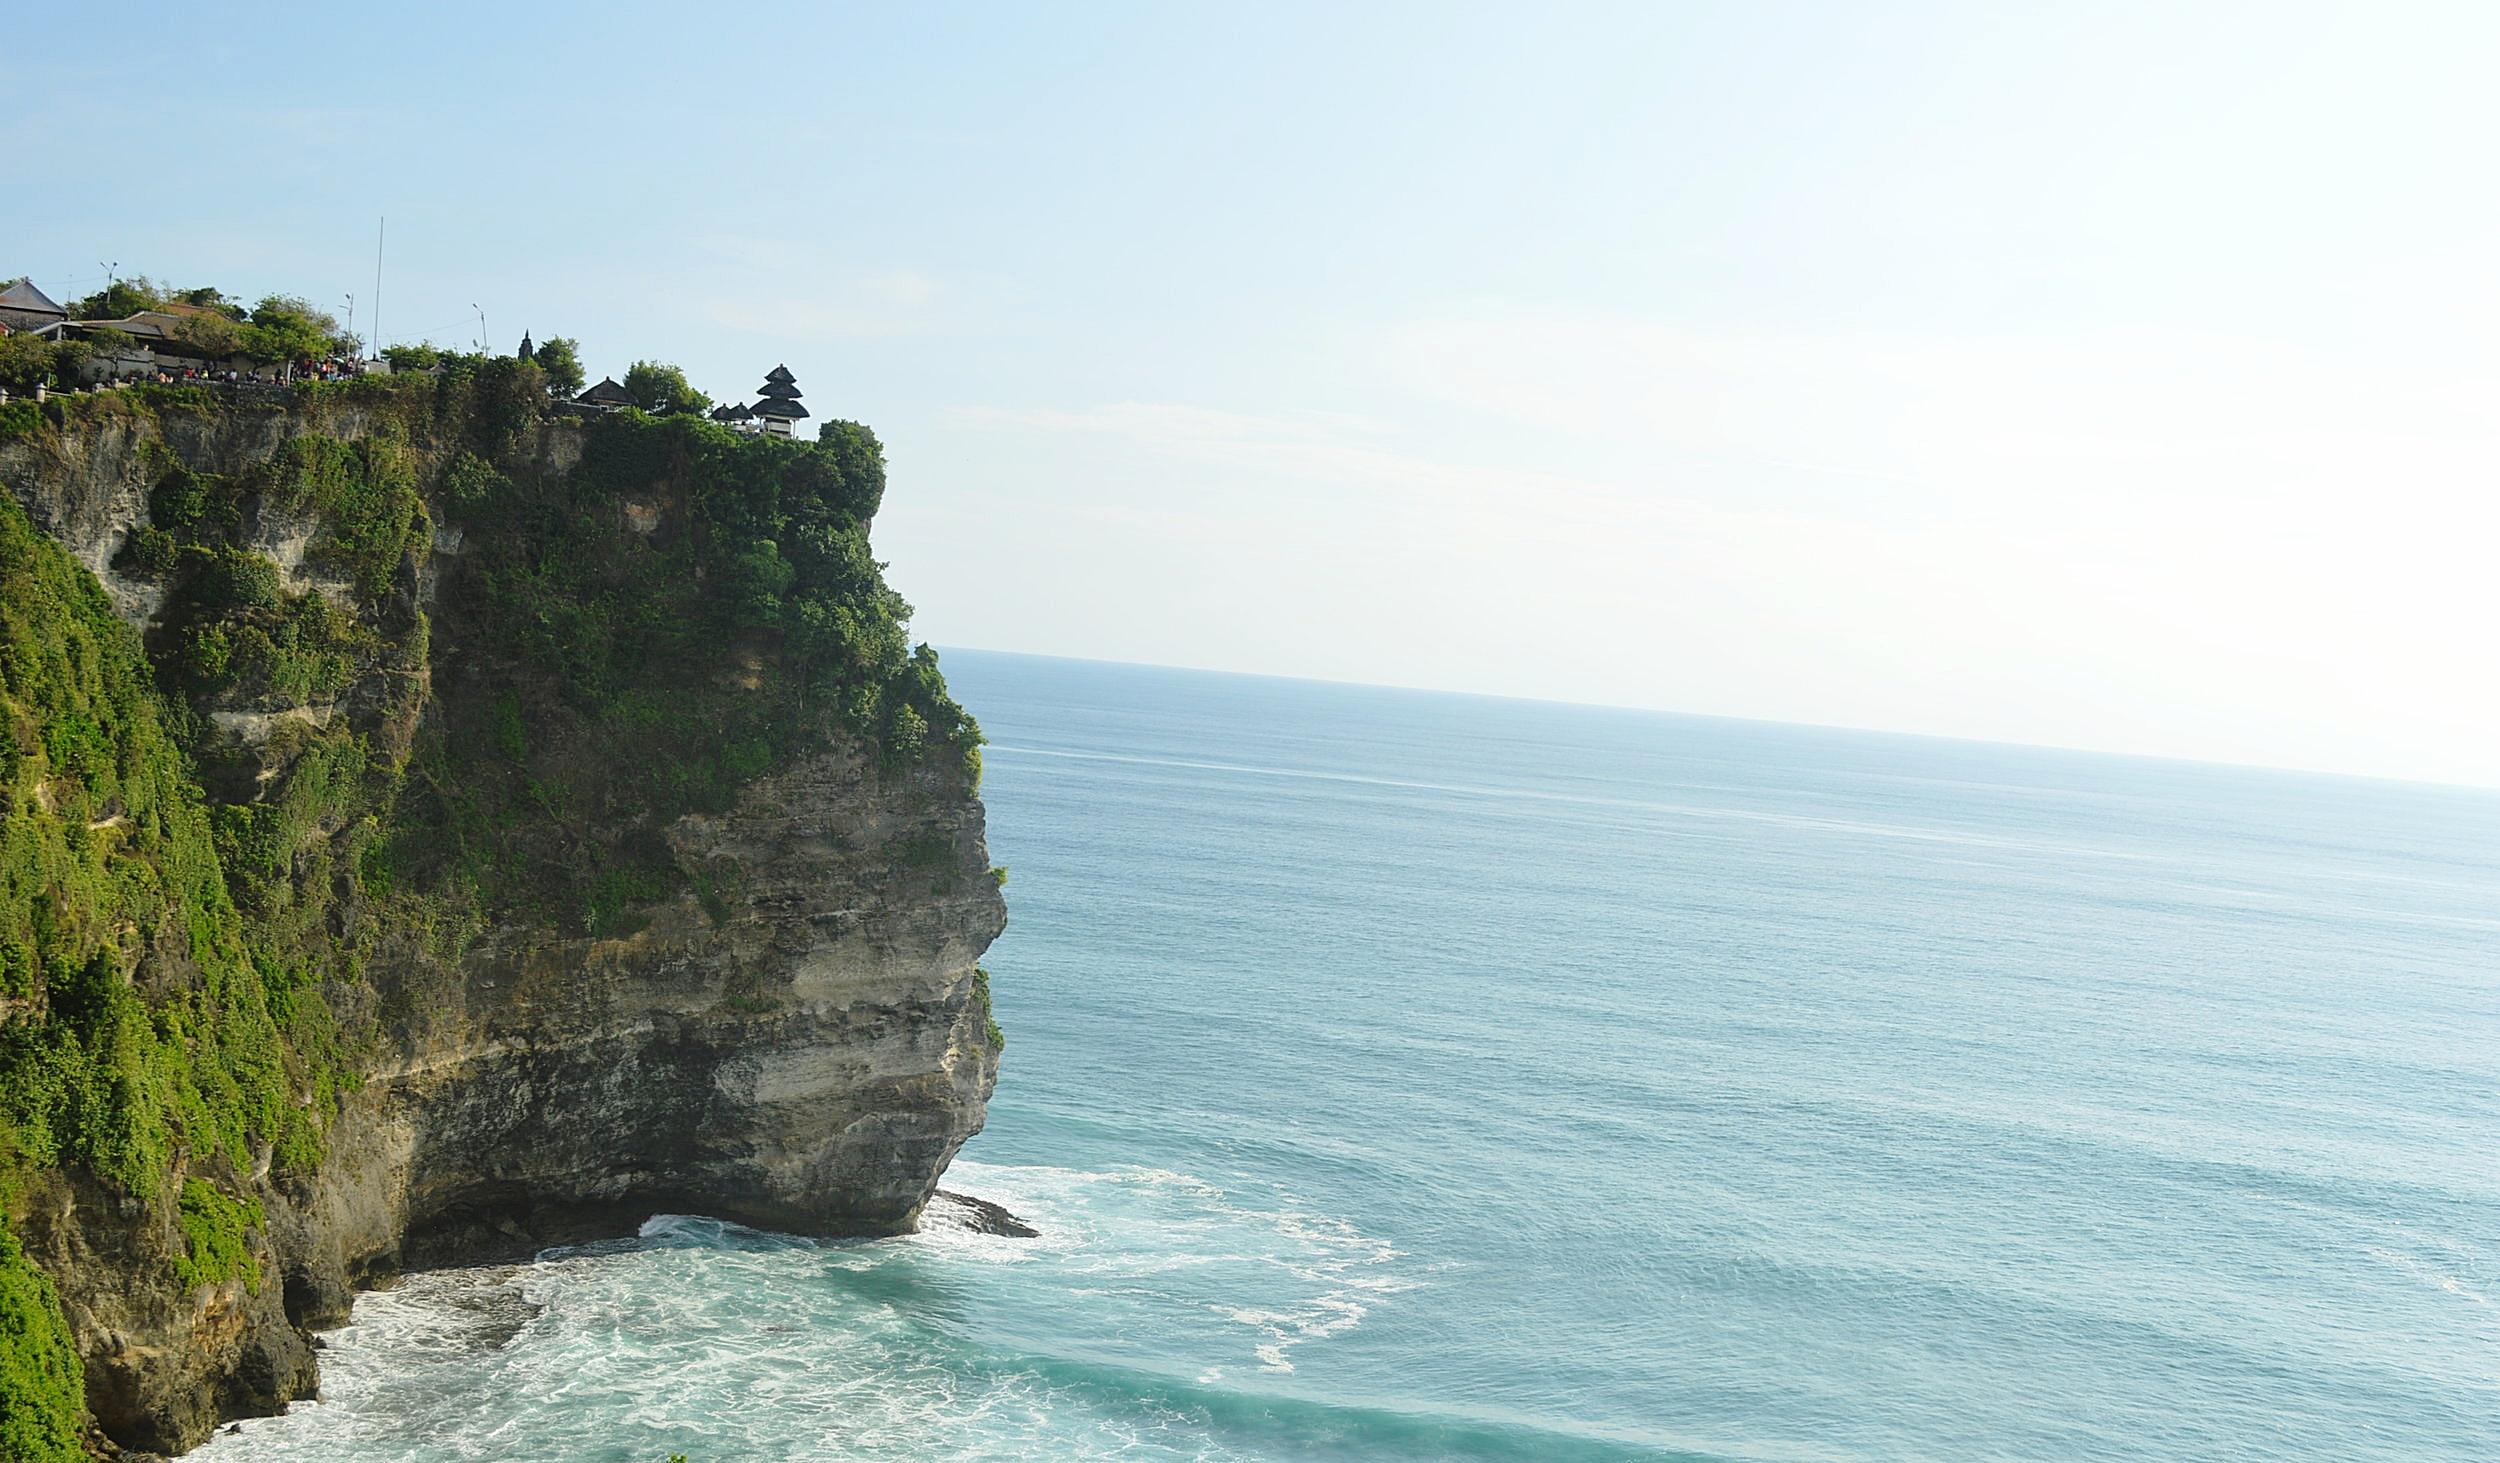 Uluwatu Temple in Bali - 14 things you must do on a trip to Bali!